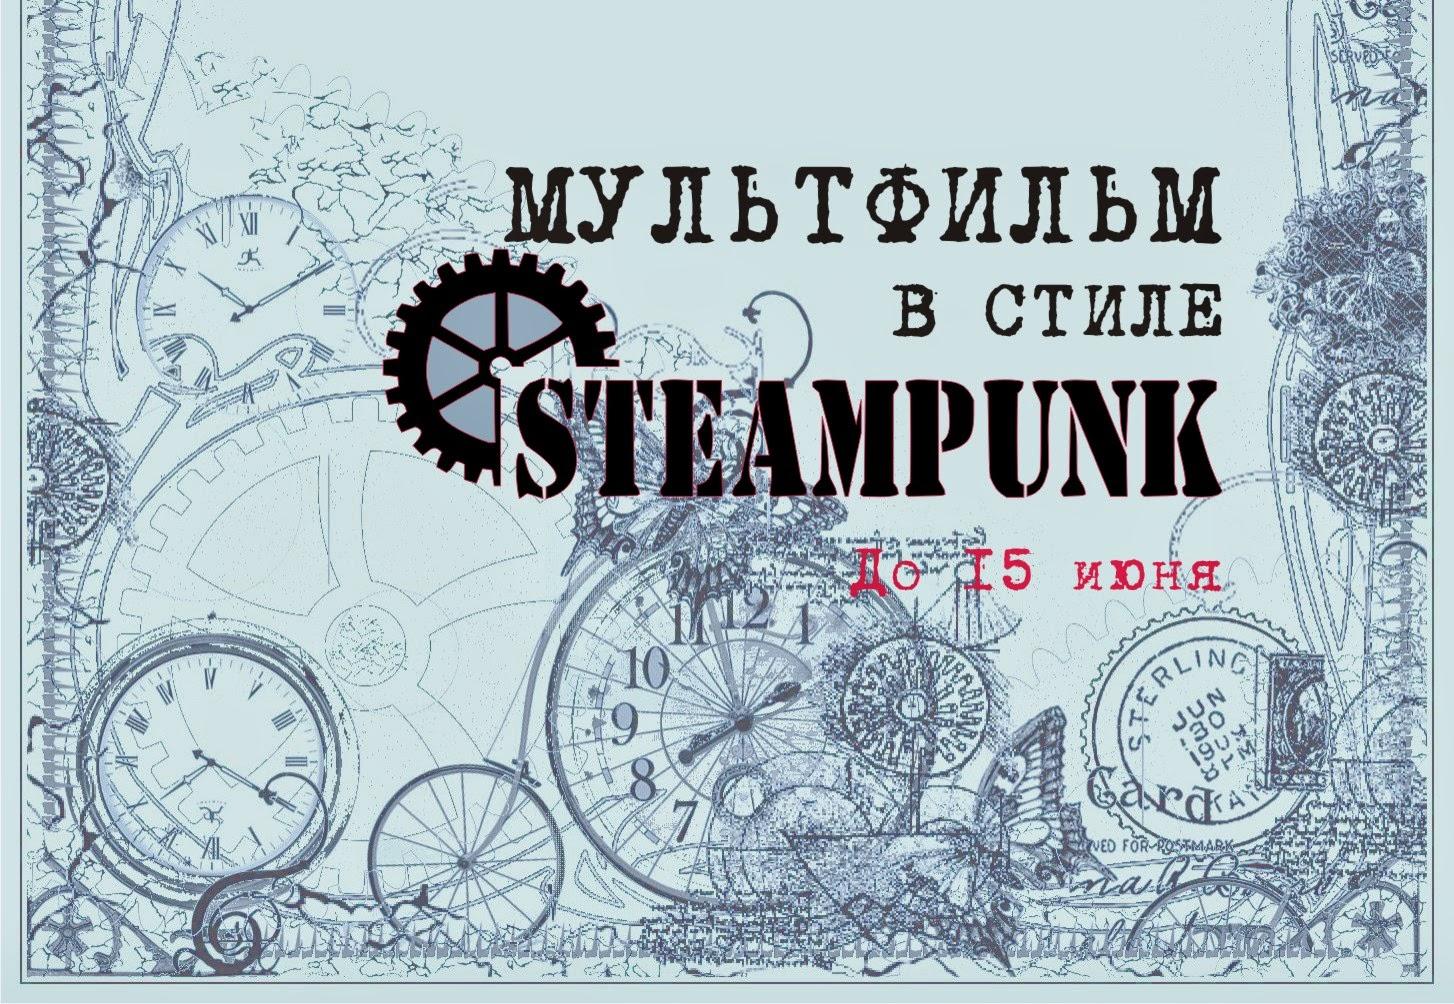 http://scrapsteampunk.blogspot.ru/2014/05/7.html